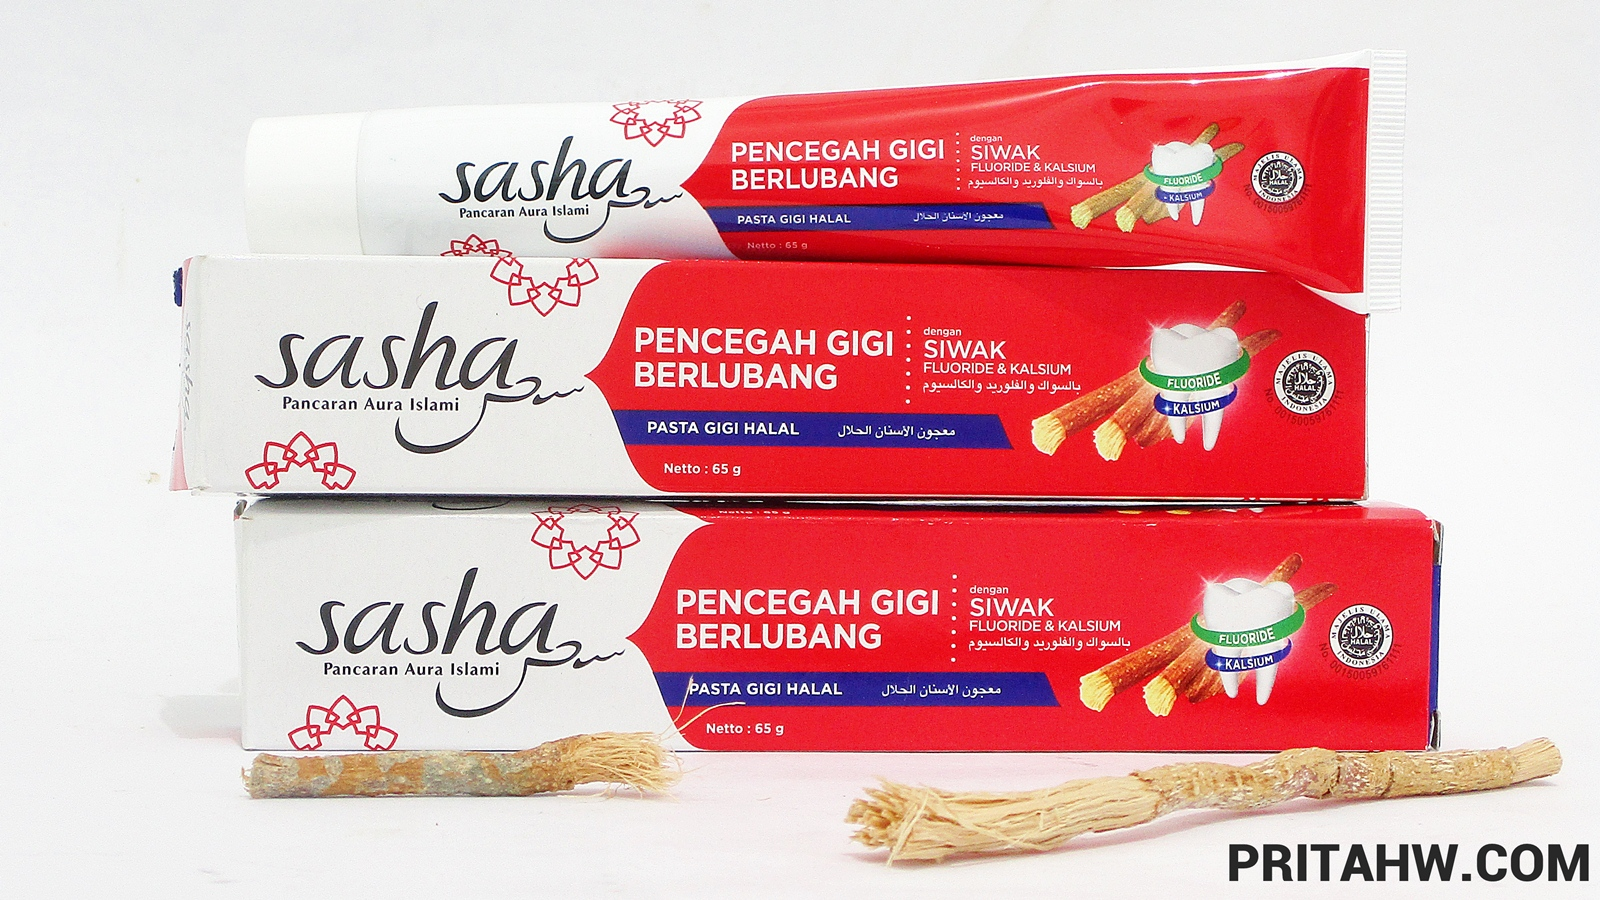 Sasha pasta gigi pencegah gigi berlubang